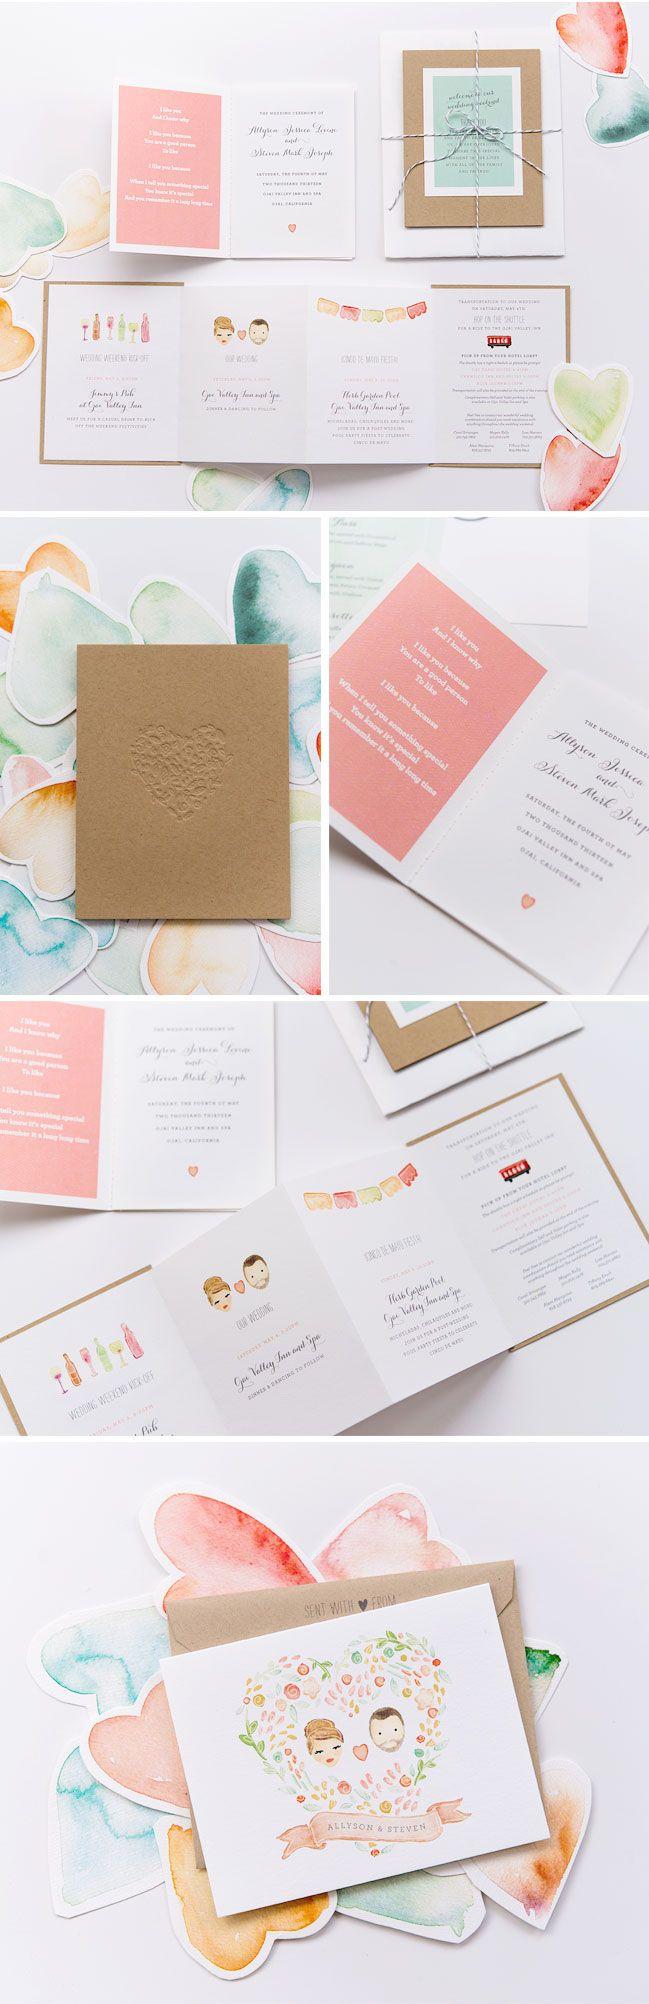 104 best Invitation Enclosures & Packaging images on Pinterest ...